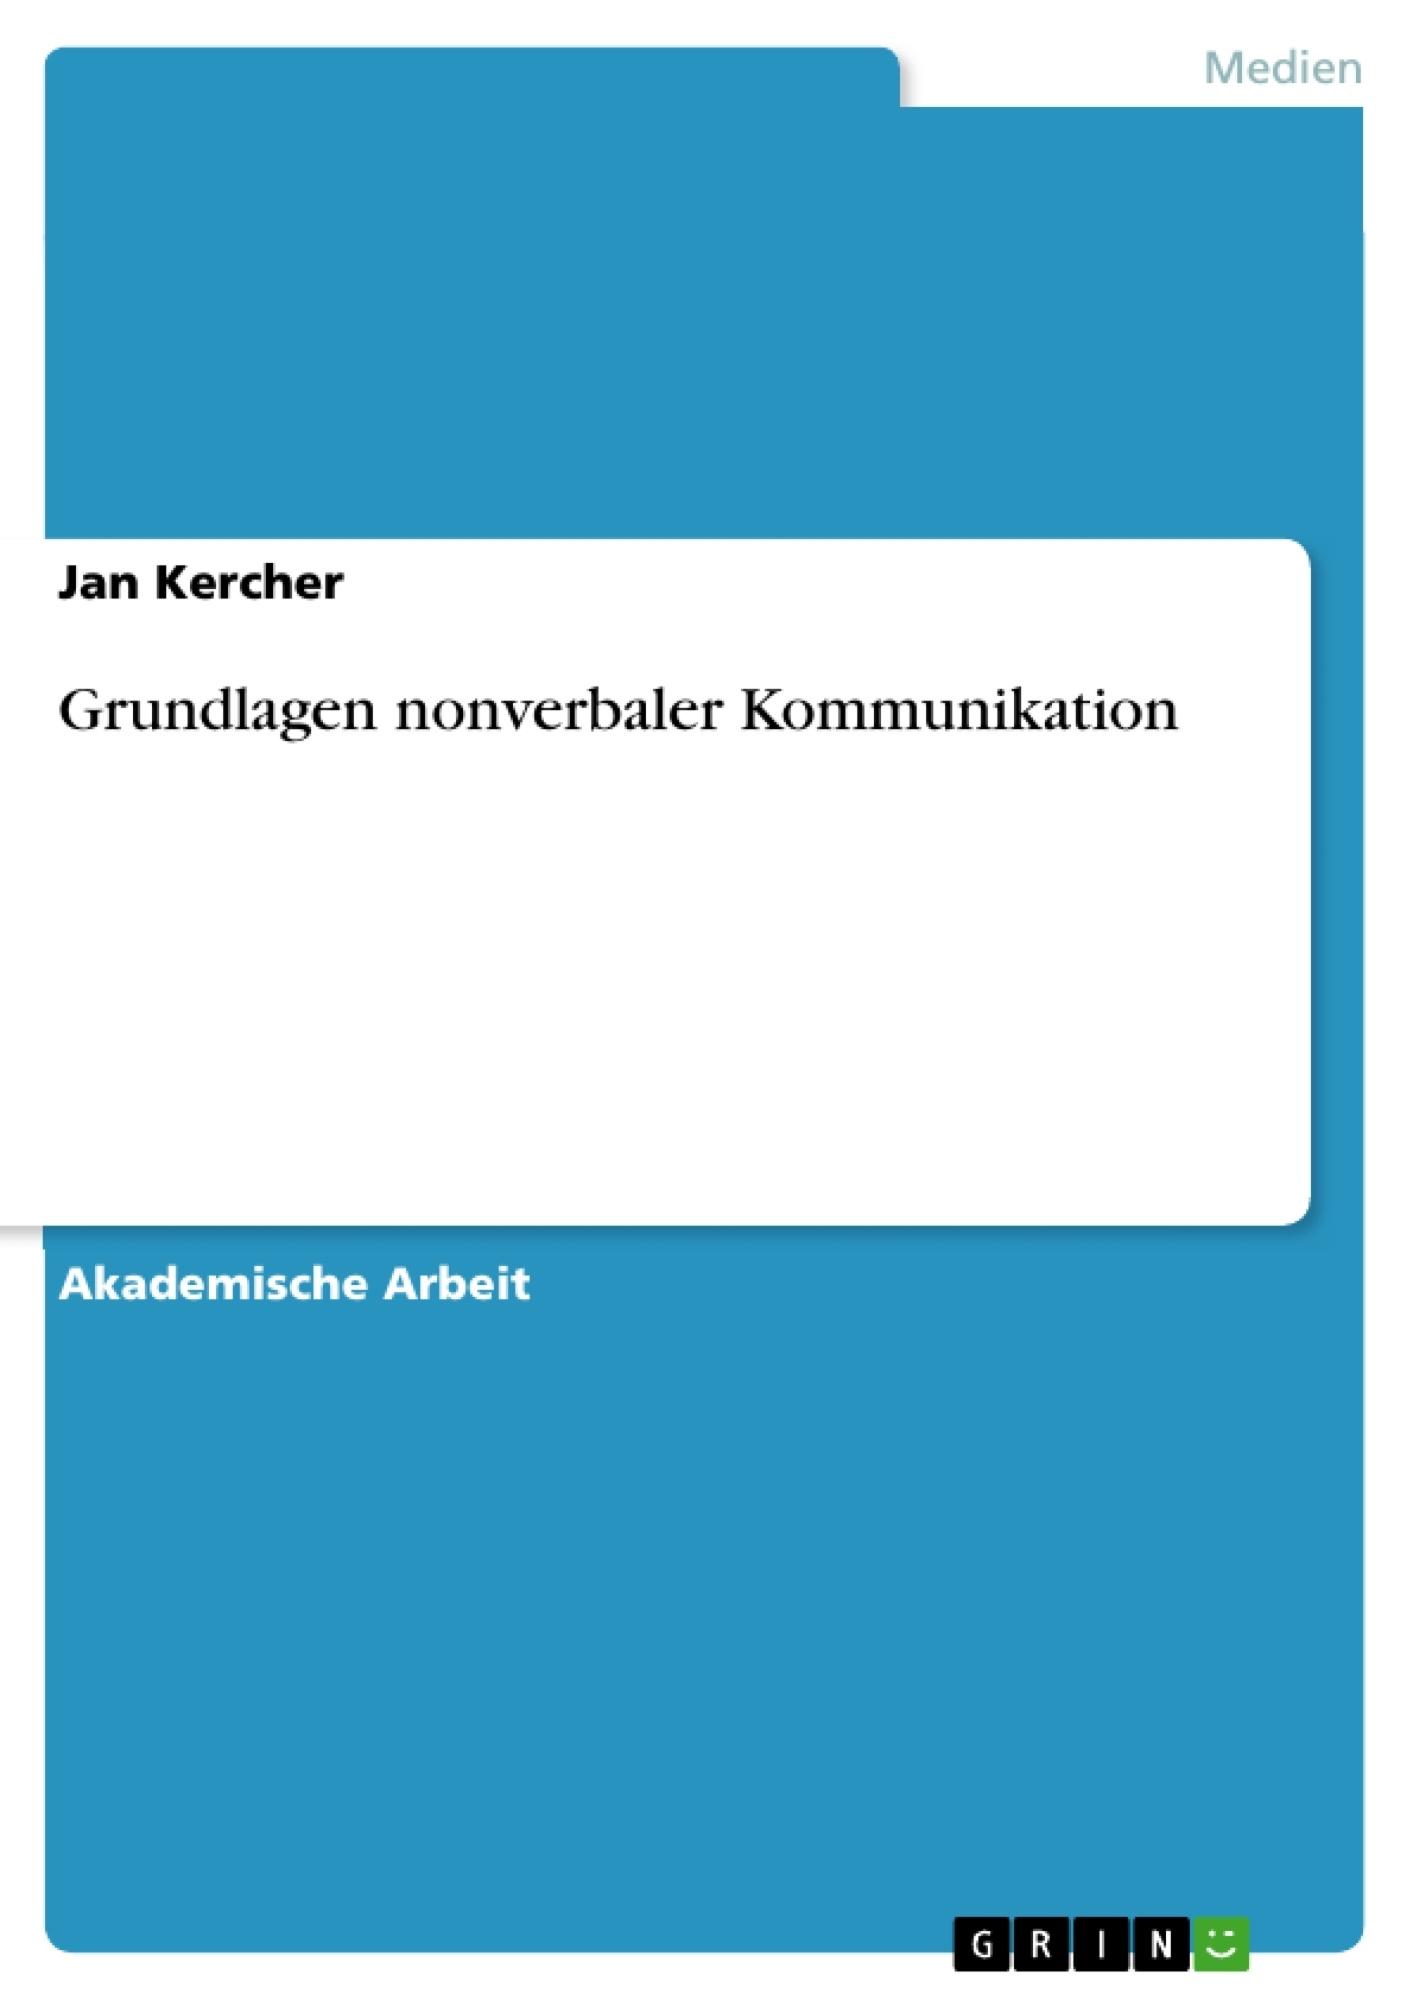 Titel: Grundlagen nonverbaler Kommunikation